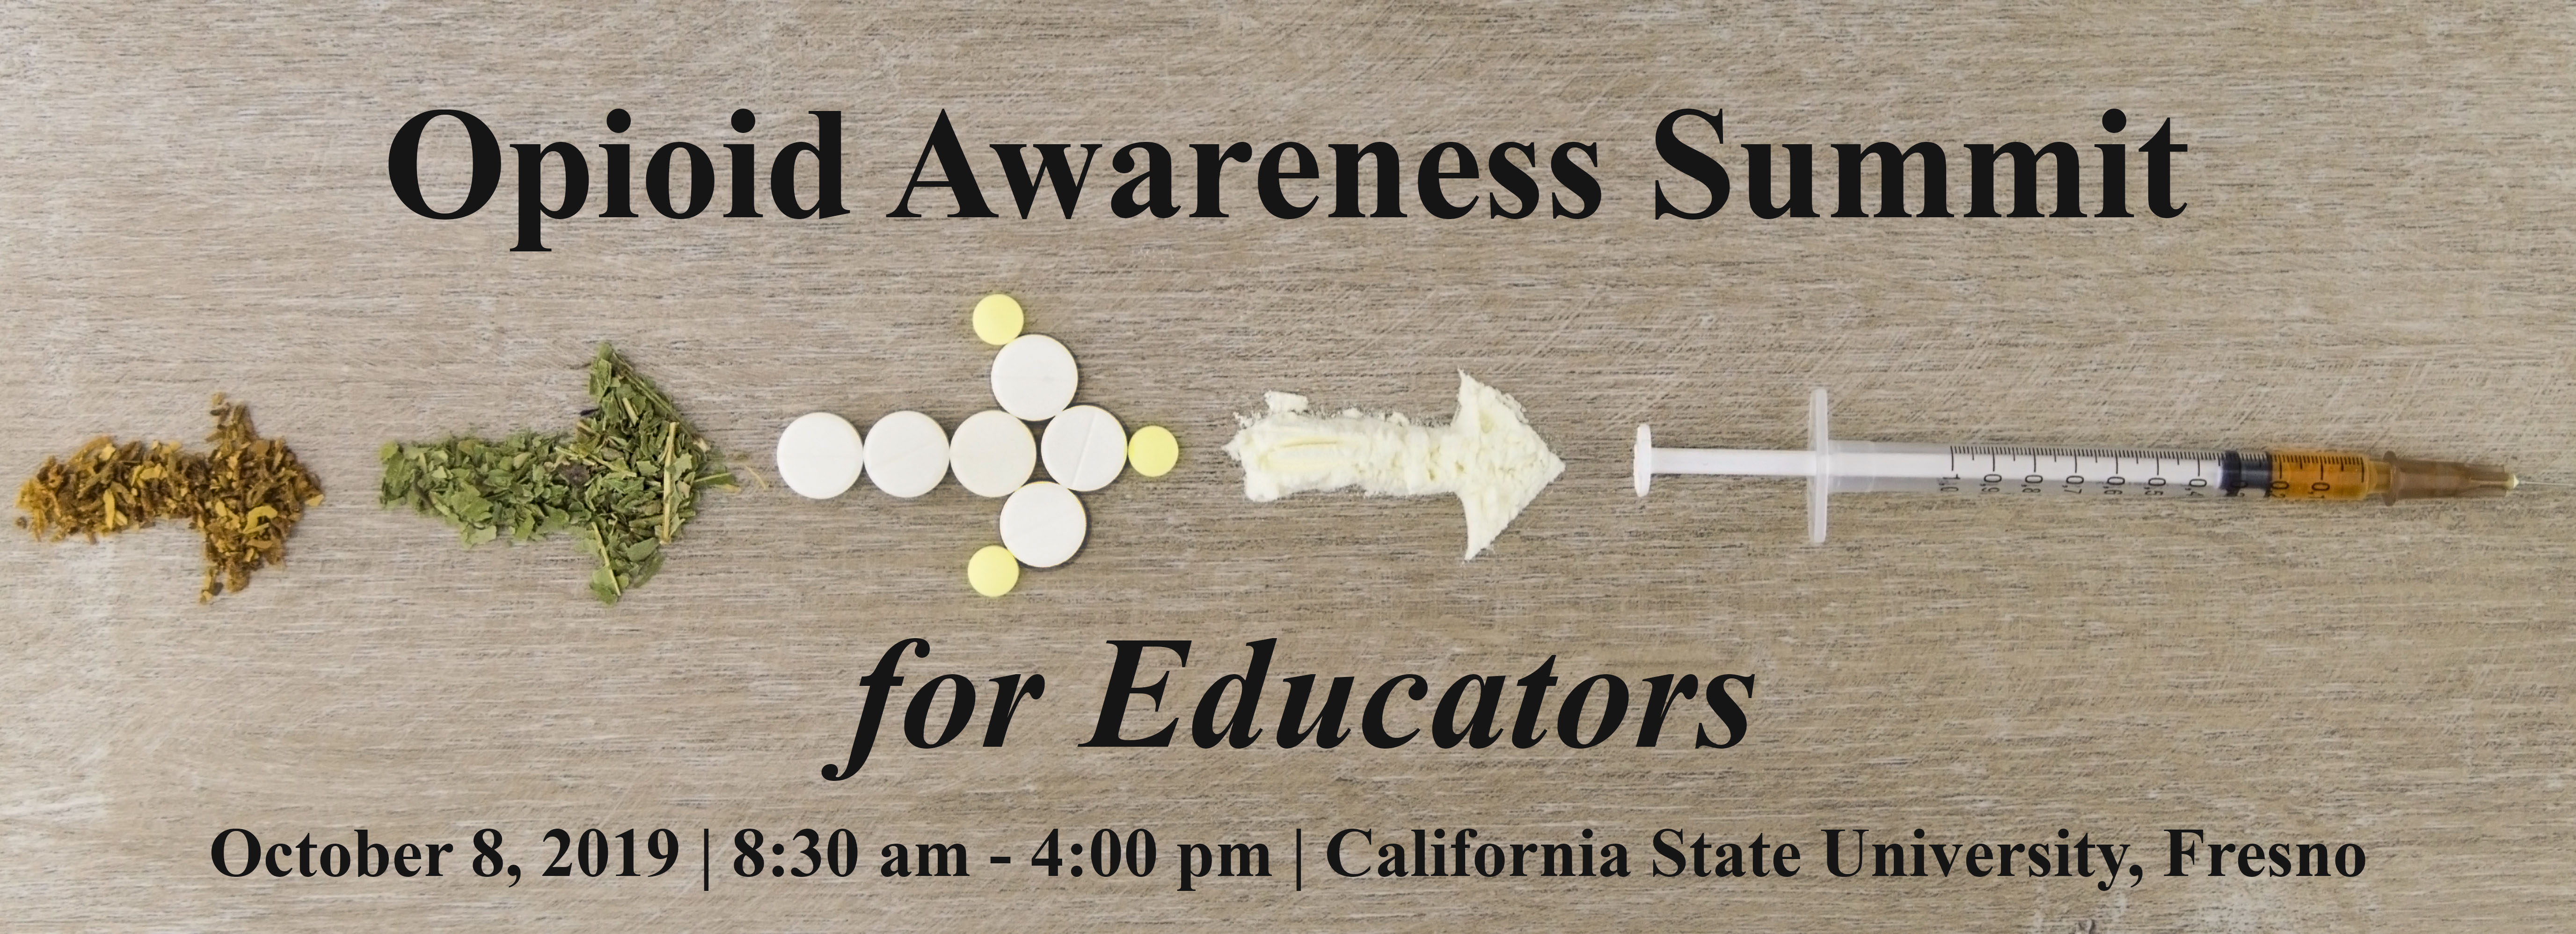 Registration Opioid Awareness Summit